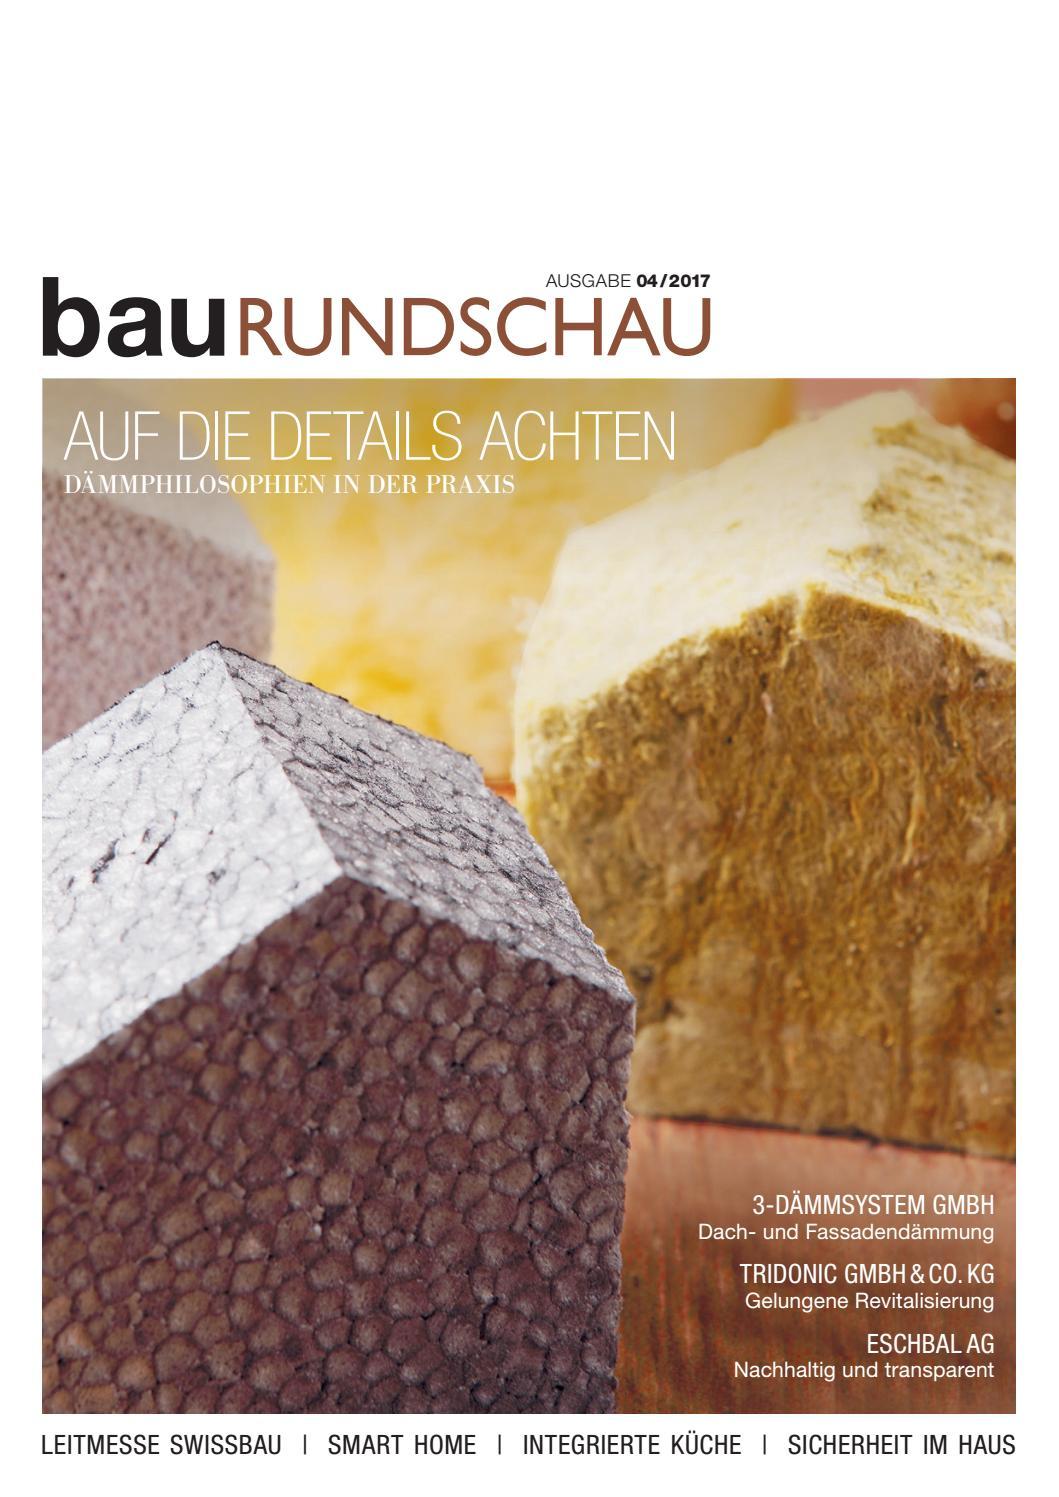 Baurundschau 04/2017 By Rundschaumedien Ag - Issuu